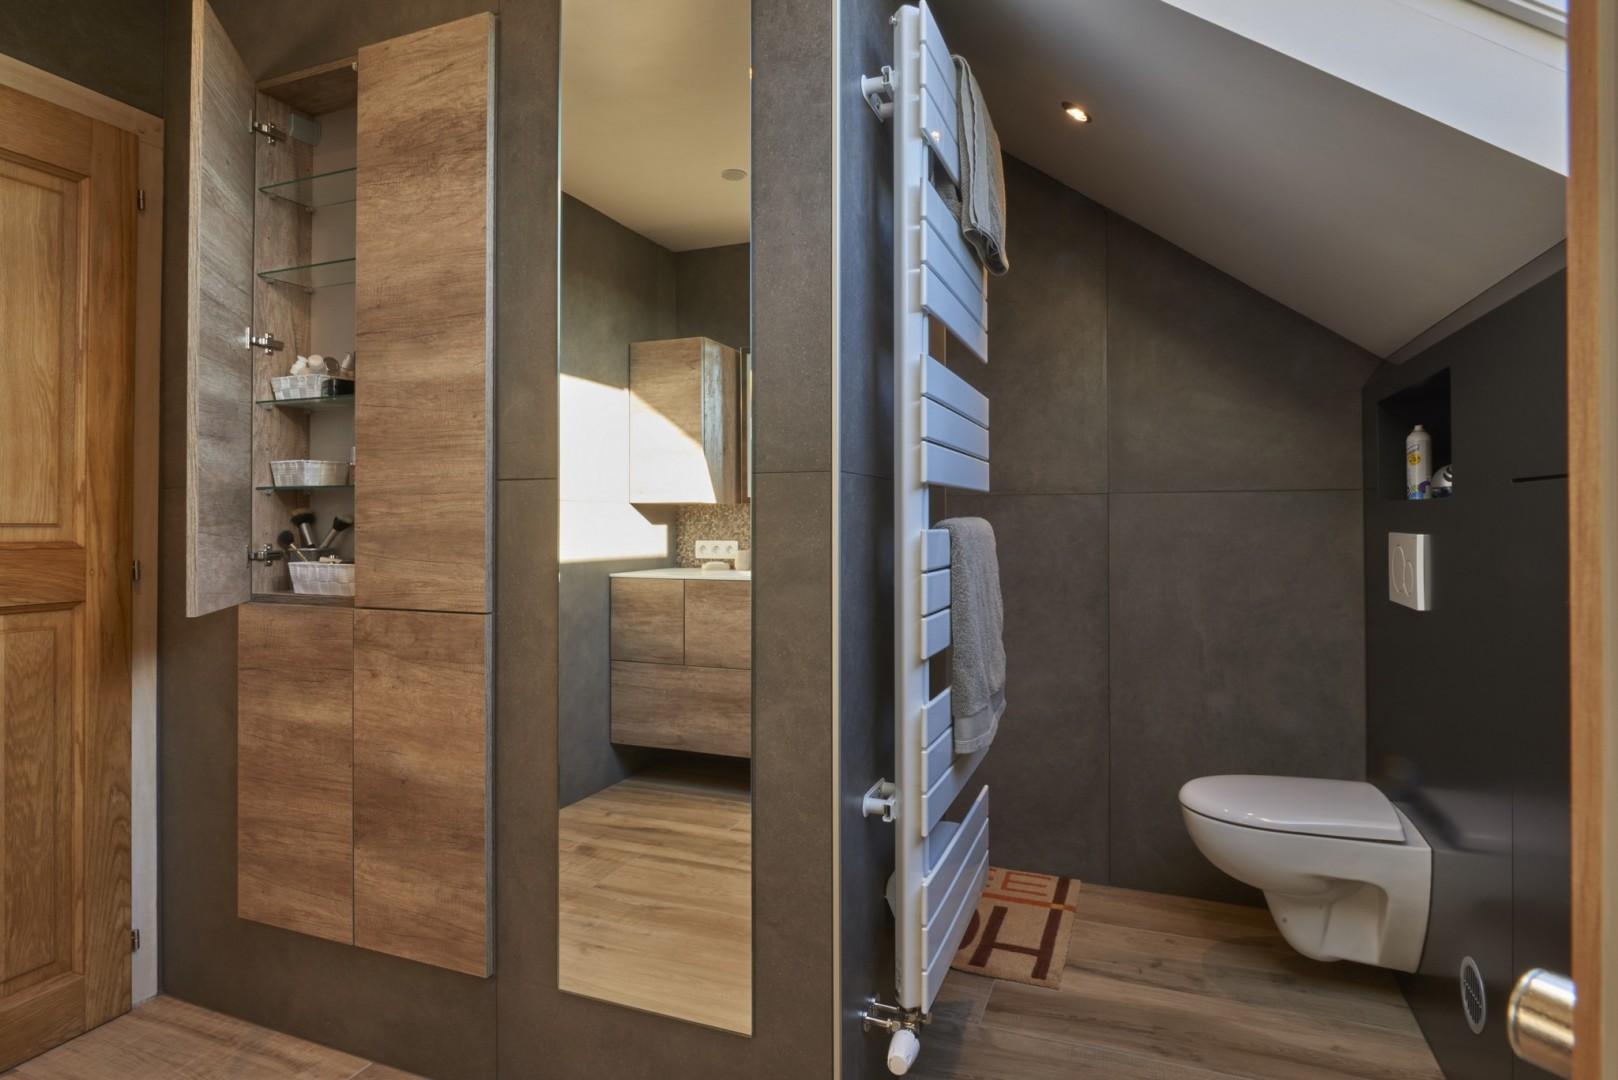 utilisation - Salle De Bain Avec Sauna